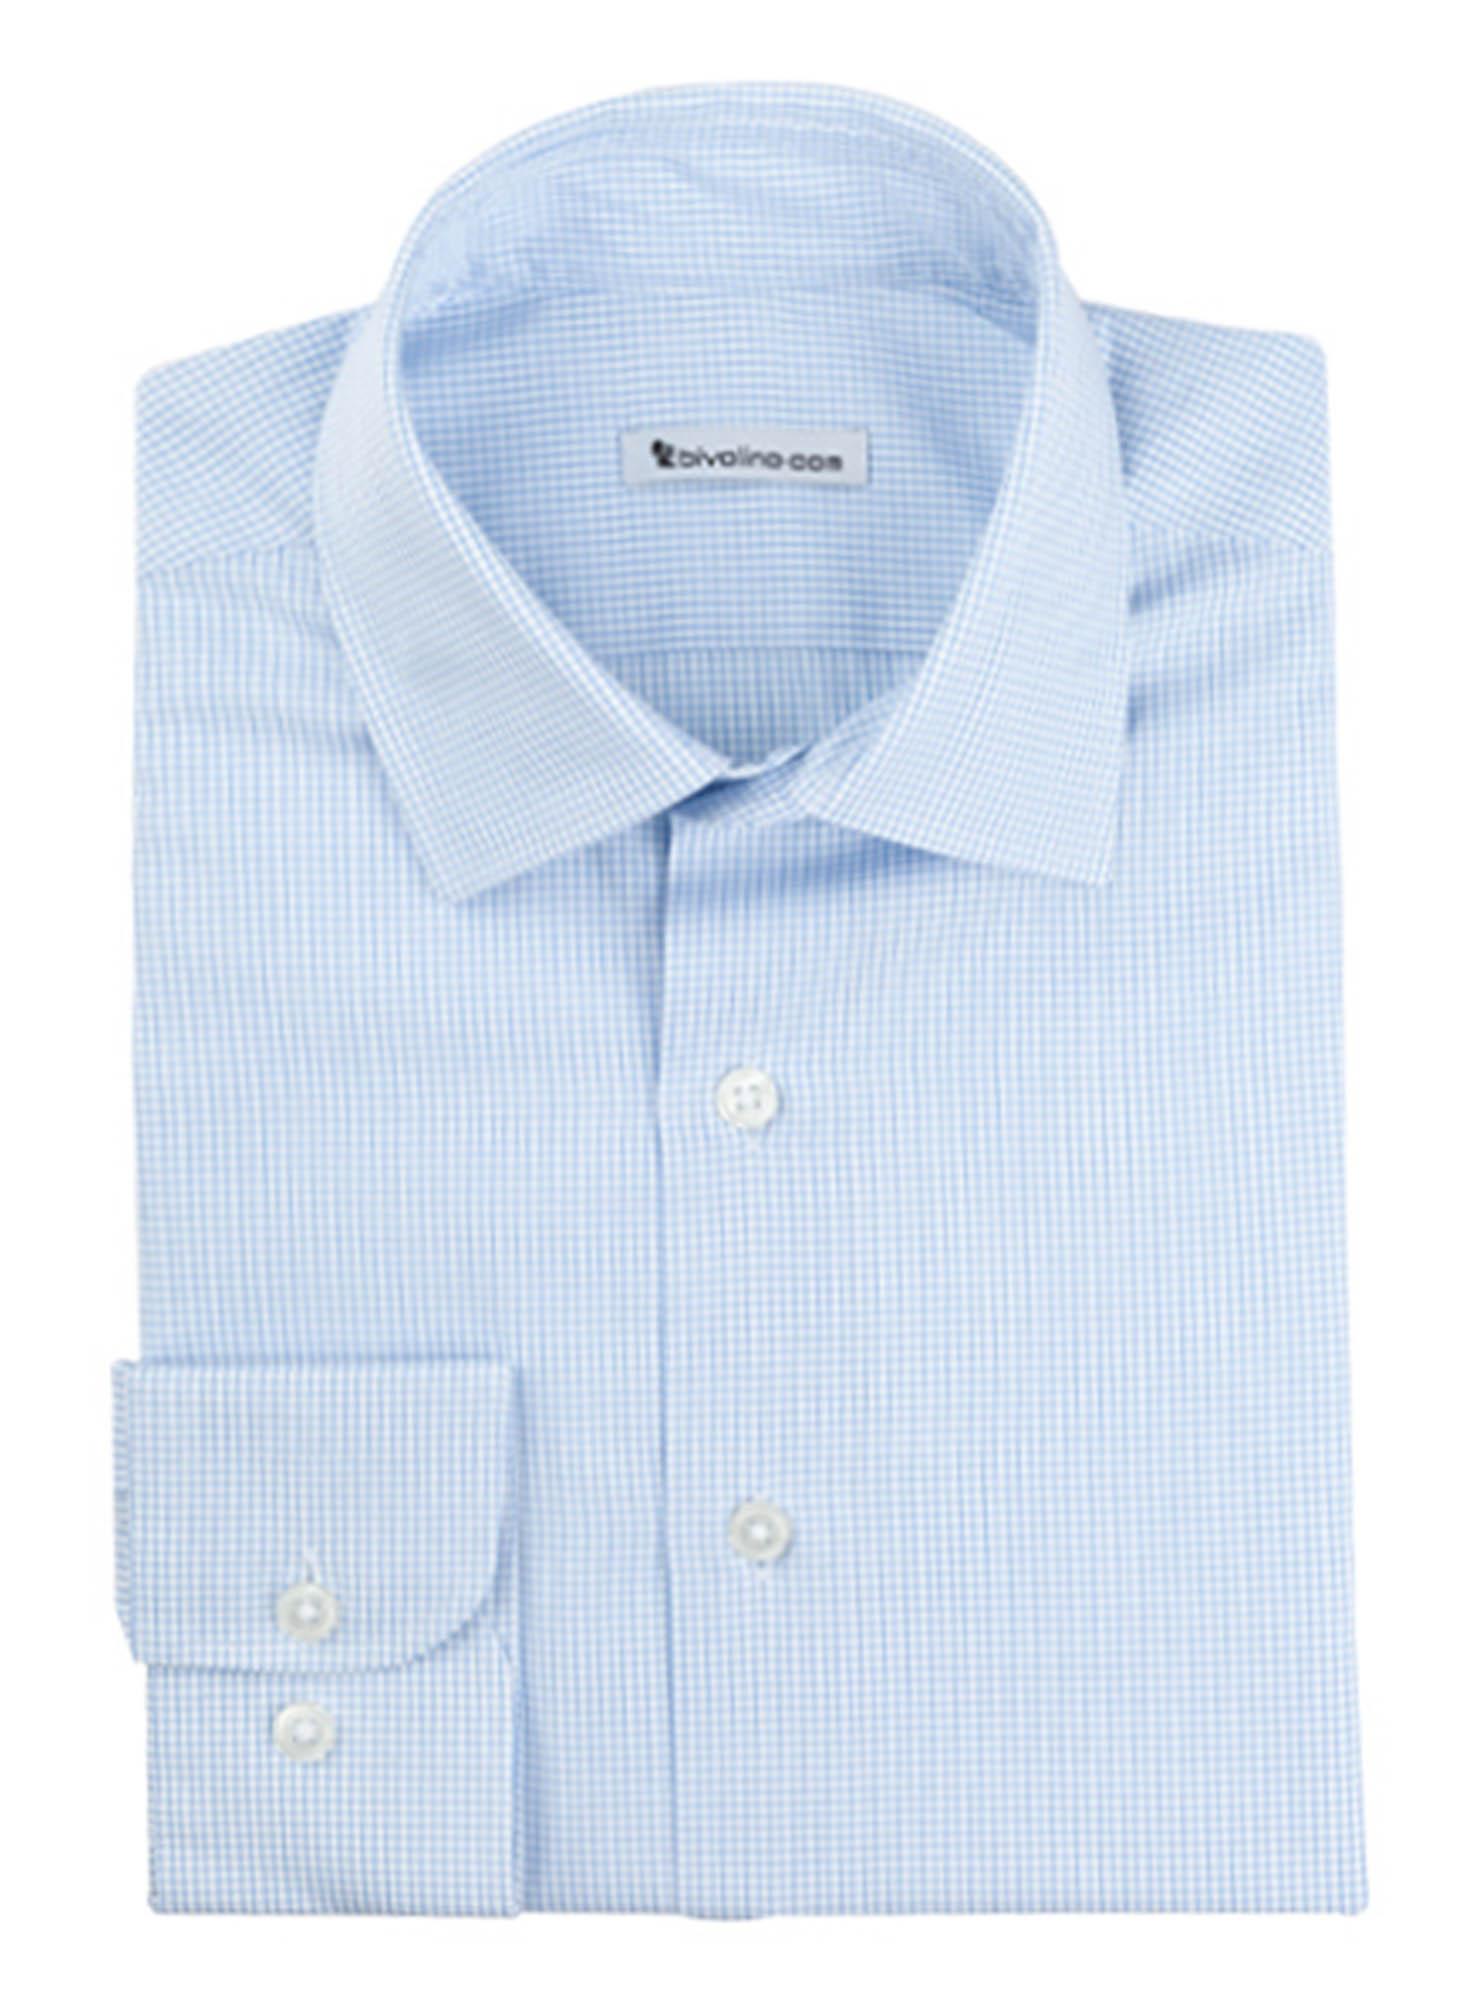 LATINA - chemise homme coton double retors égyptien Thomas Mason - ORIS 3